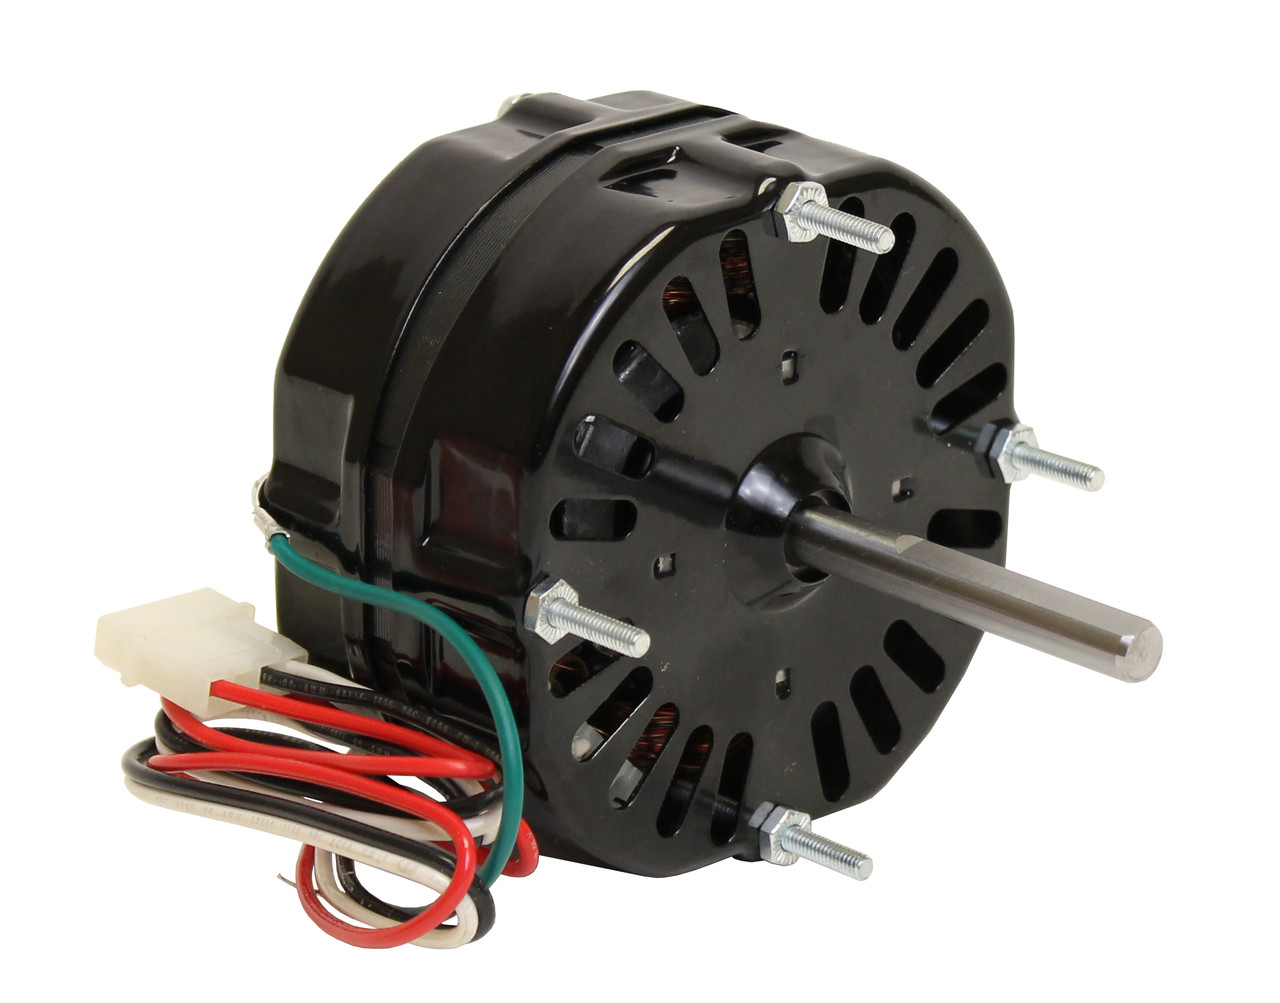 615053A__31268.1504204697.1280.1280?c=2 dayton, broan and lomanco attic fan motors electric motor warehouse  at alyssarenee.co